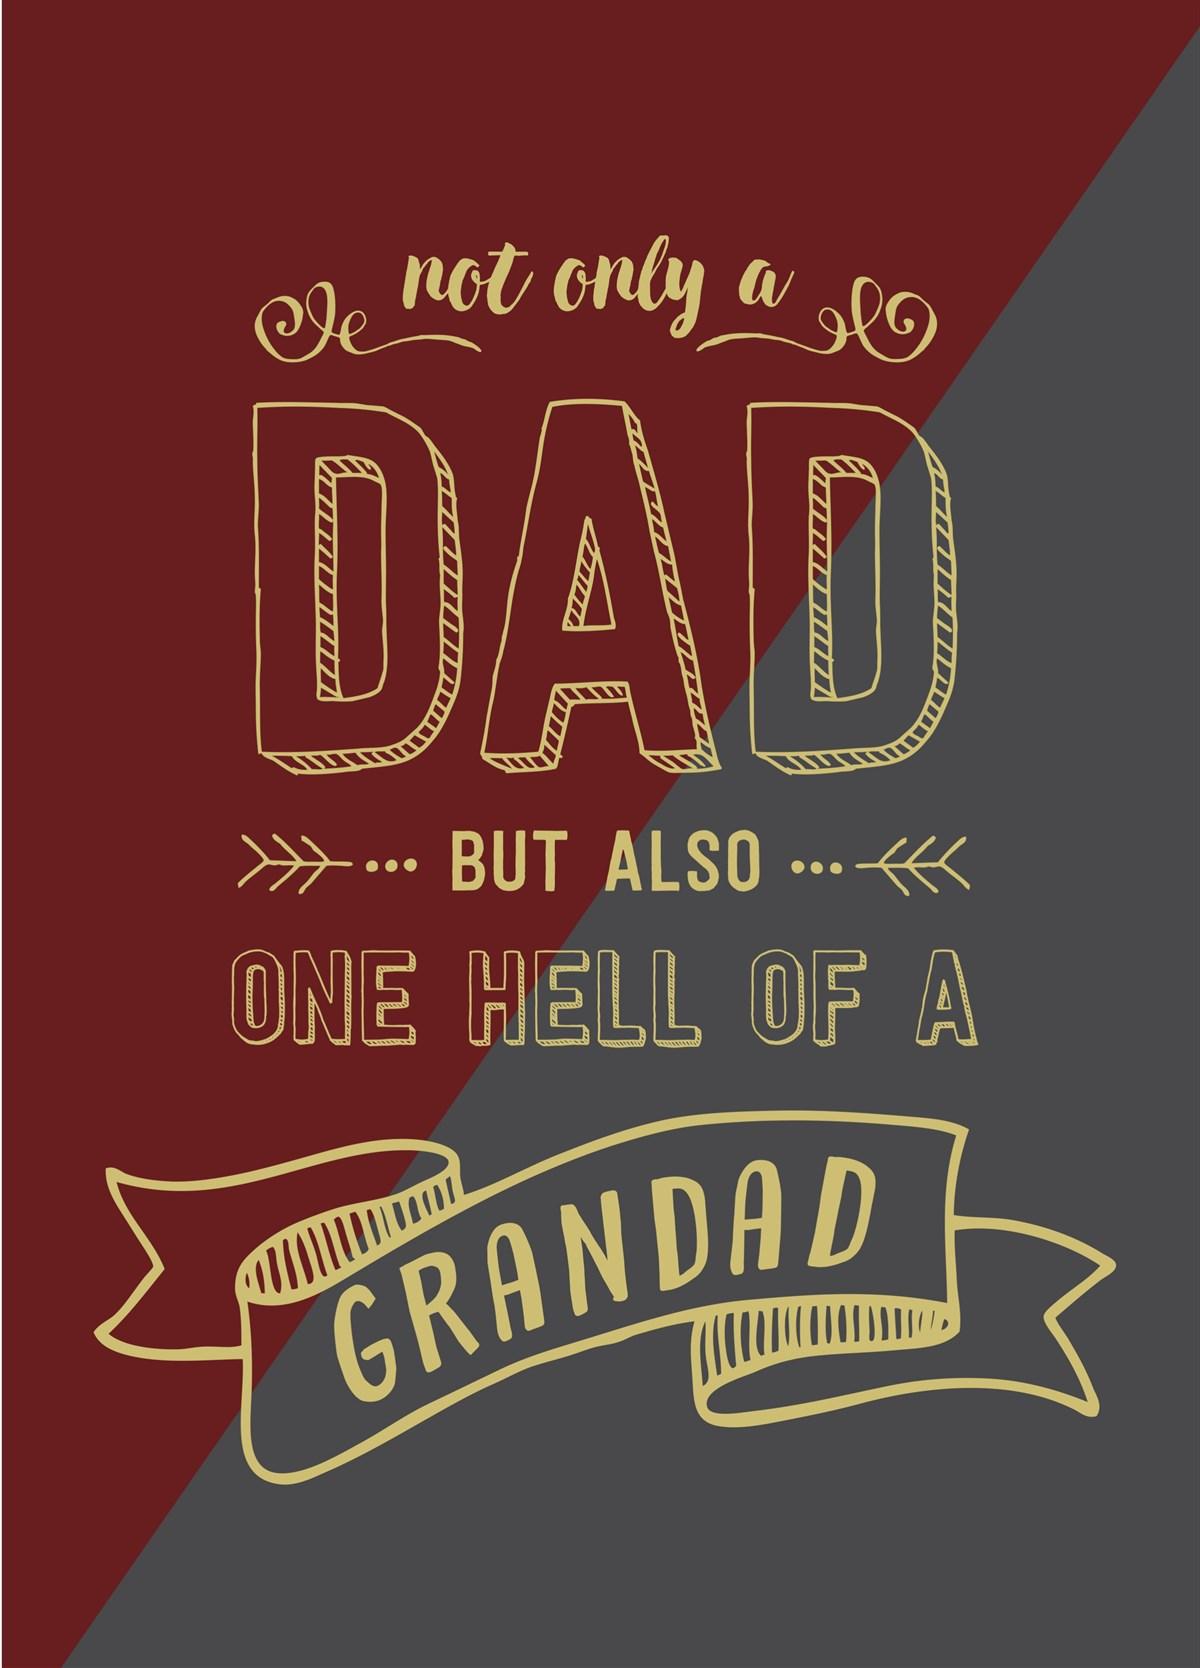 fd4 Fathers day card GRANDAD